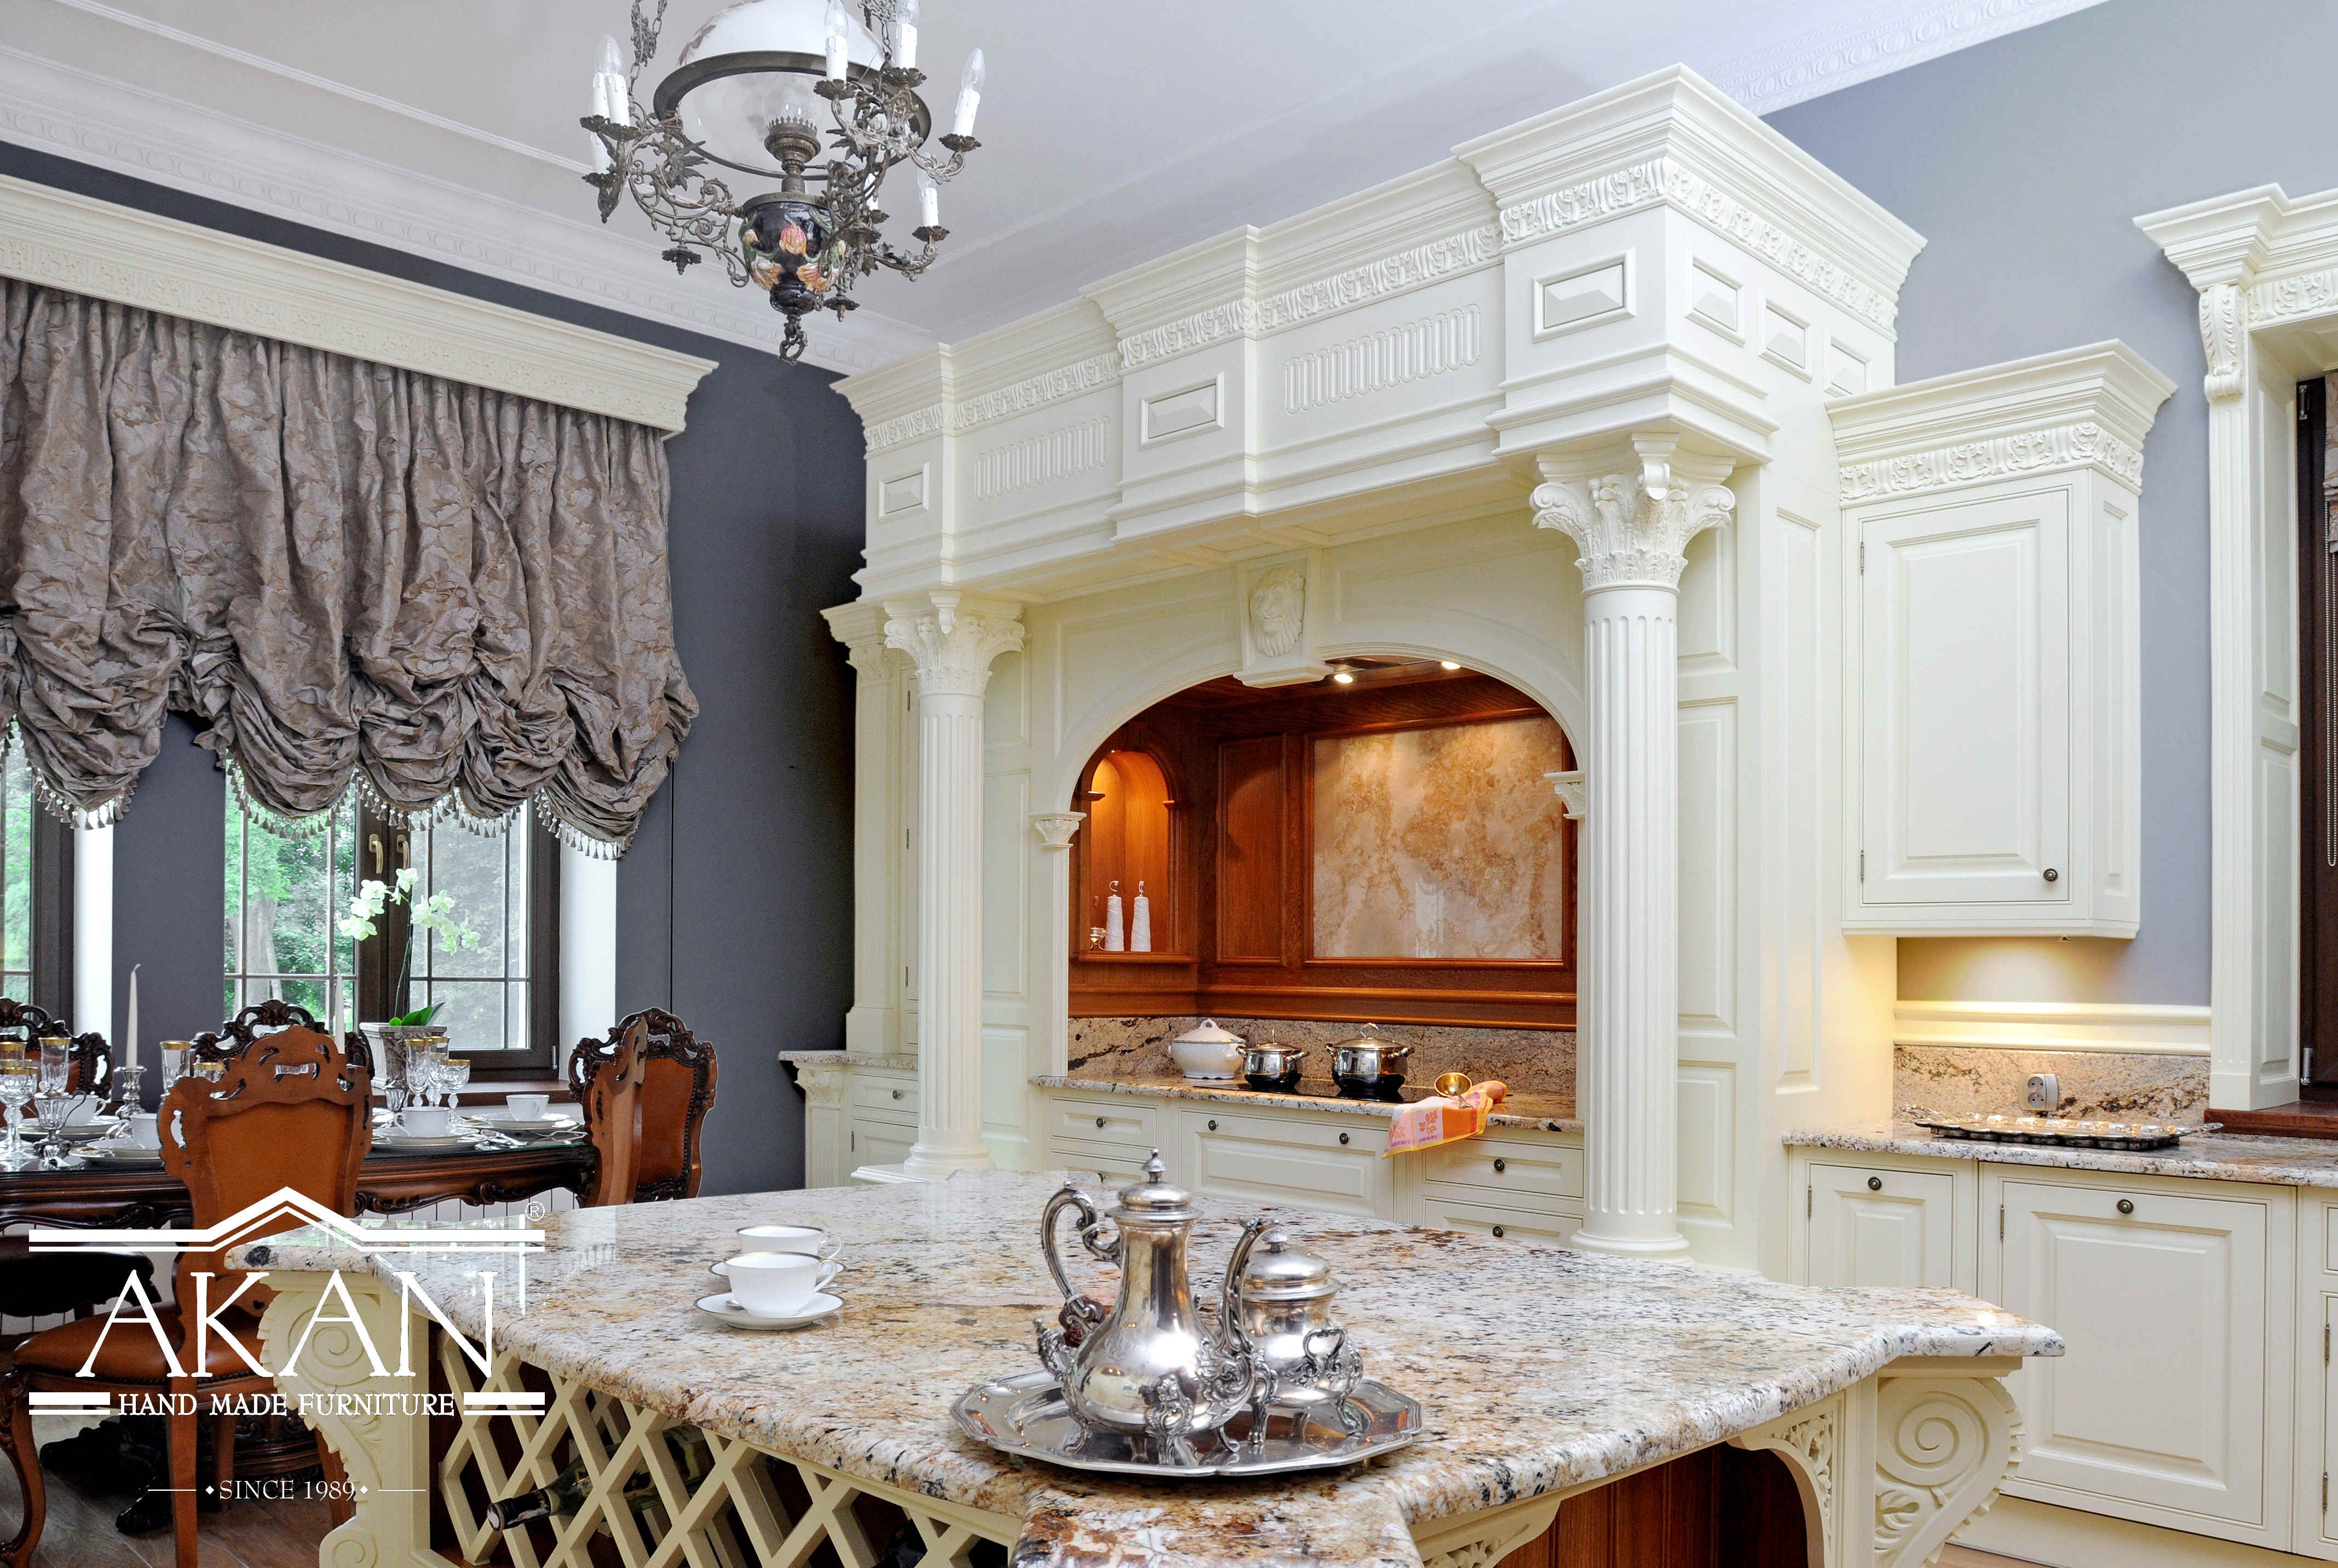 Luksusowa Zabudowa Kuchni Pilastry W Kuchni Stanowisko Piecowe Wyspa Kuchenna I Winiarka Beautiful Luxury Royal Kitchen In White Crea Home Home Decor Decor